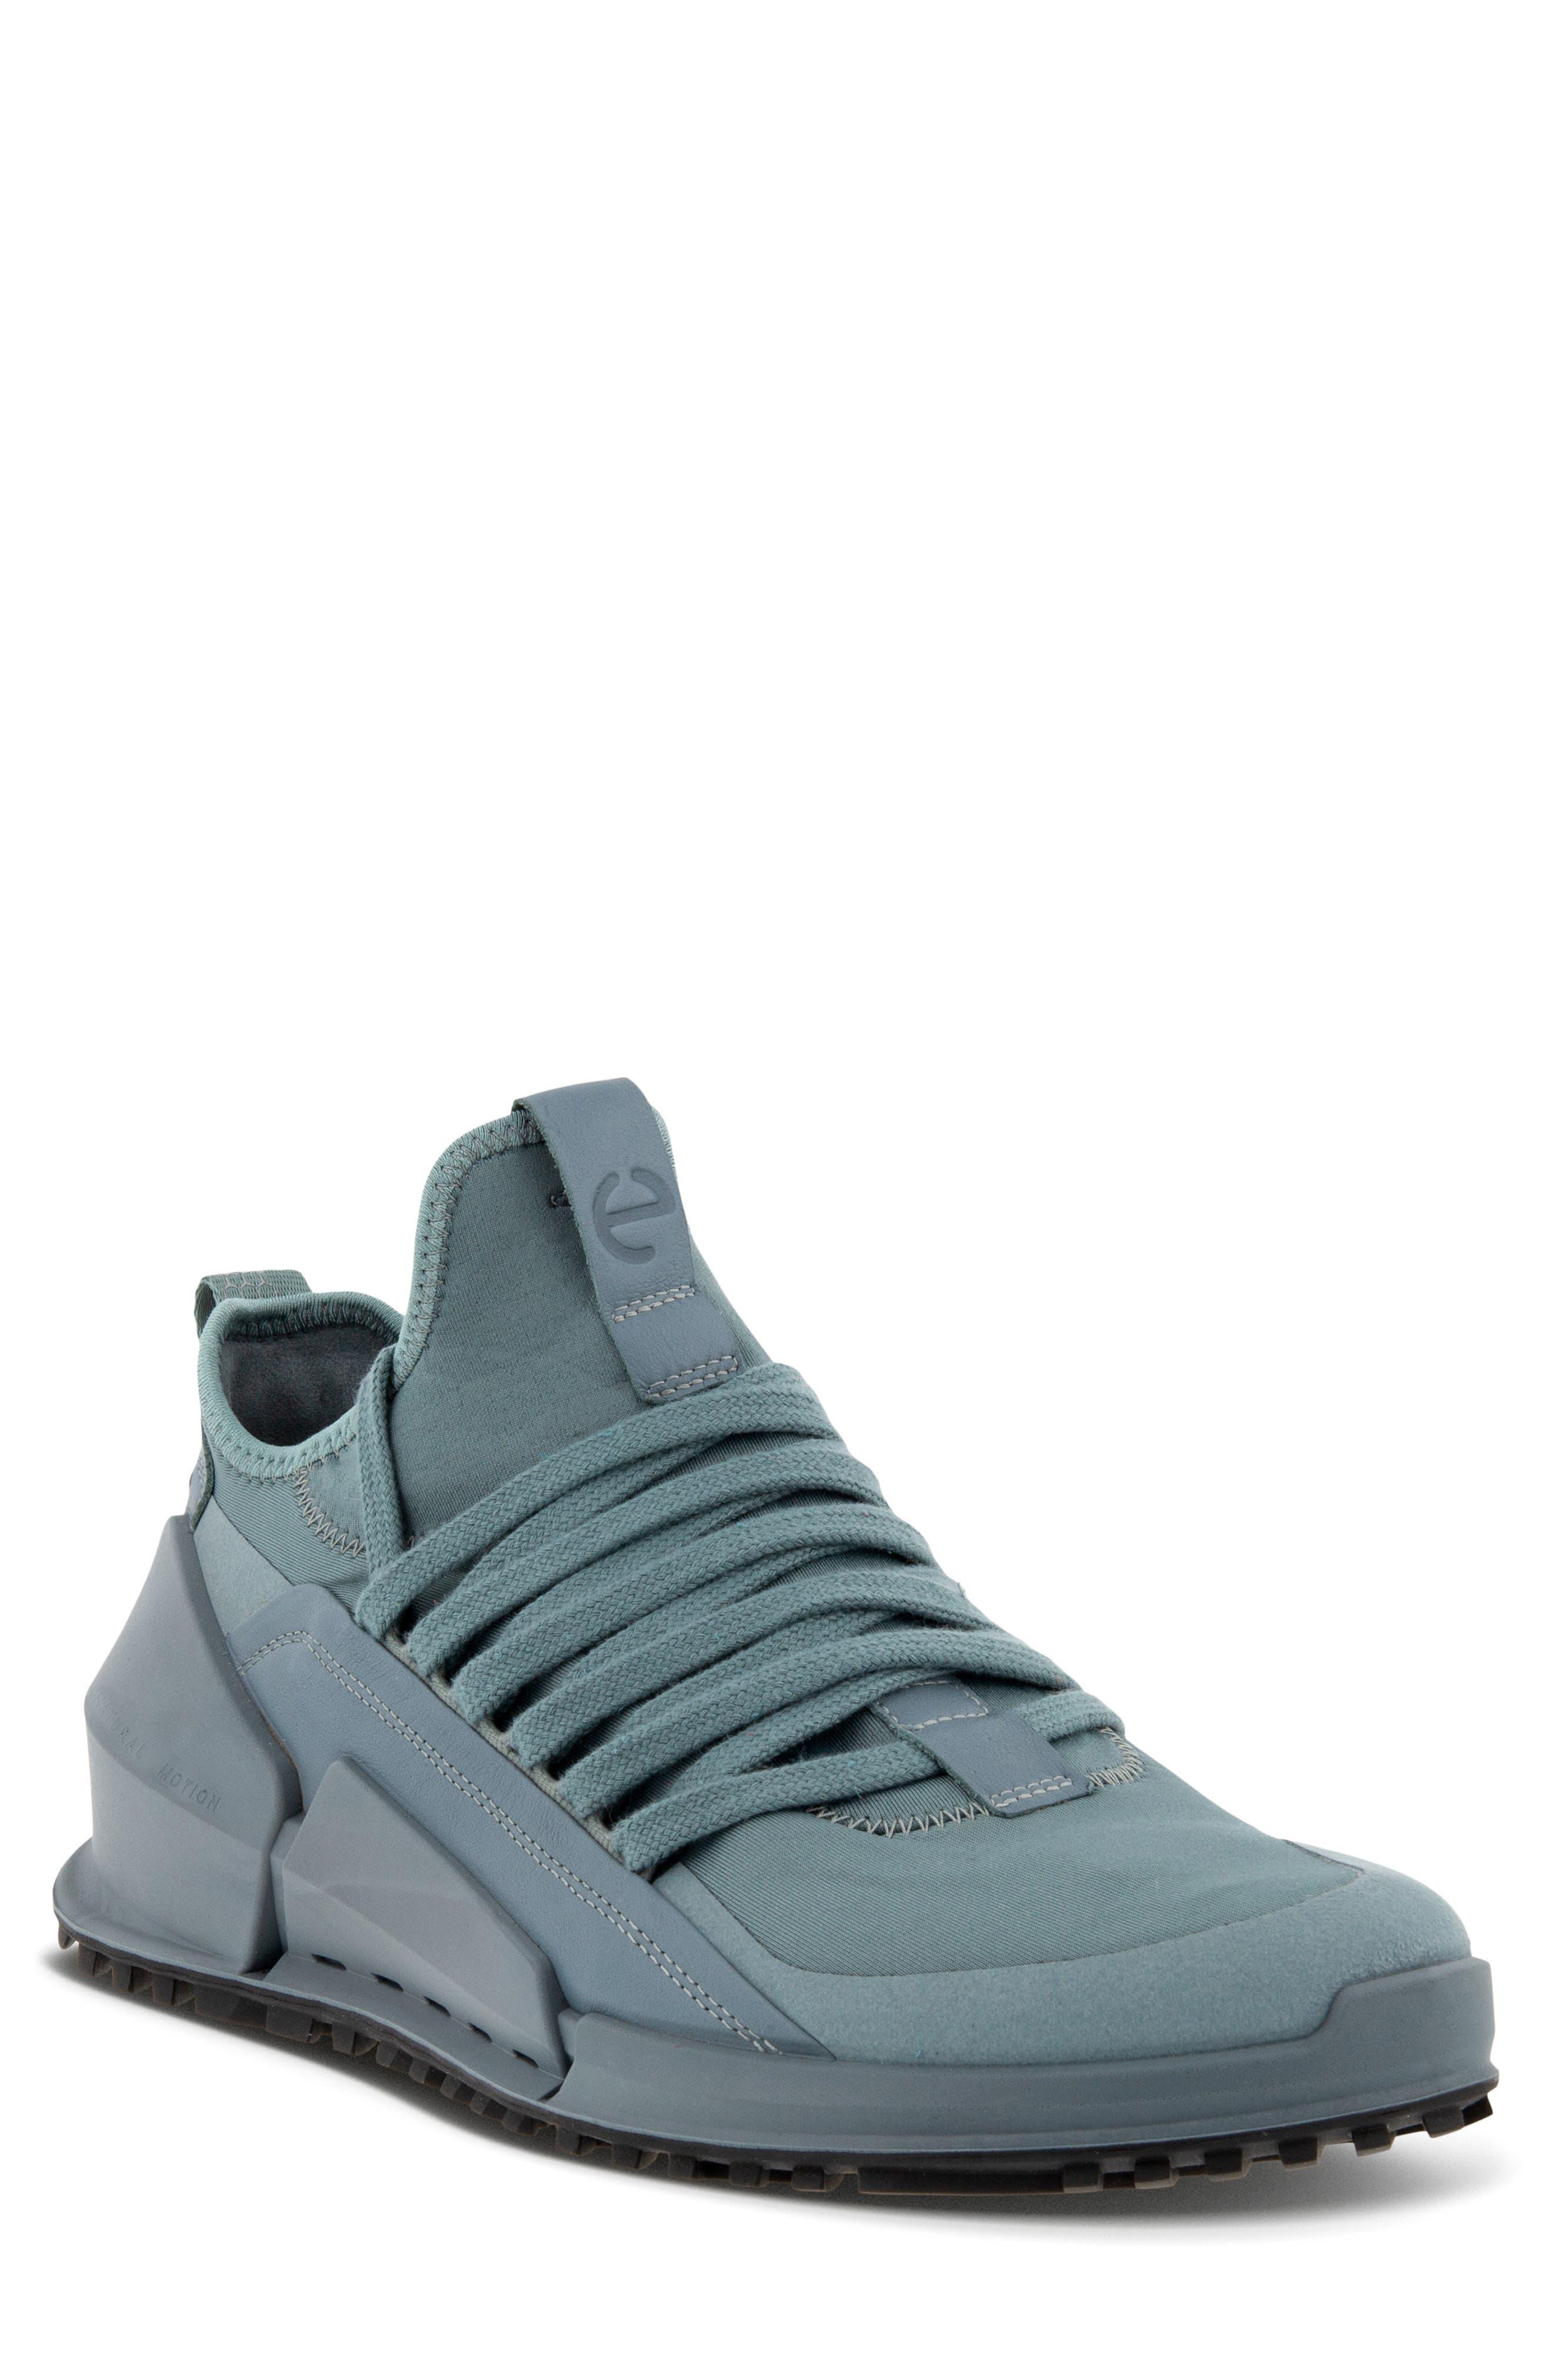 Men's Ecco Biom 2.0 Low Tex Sneaker